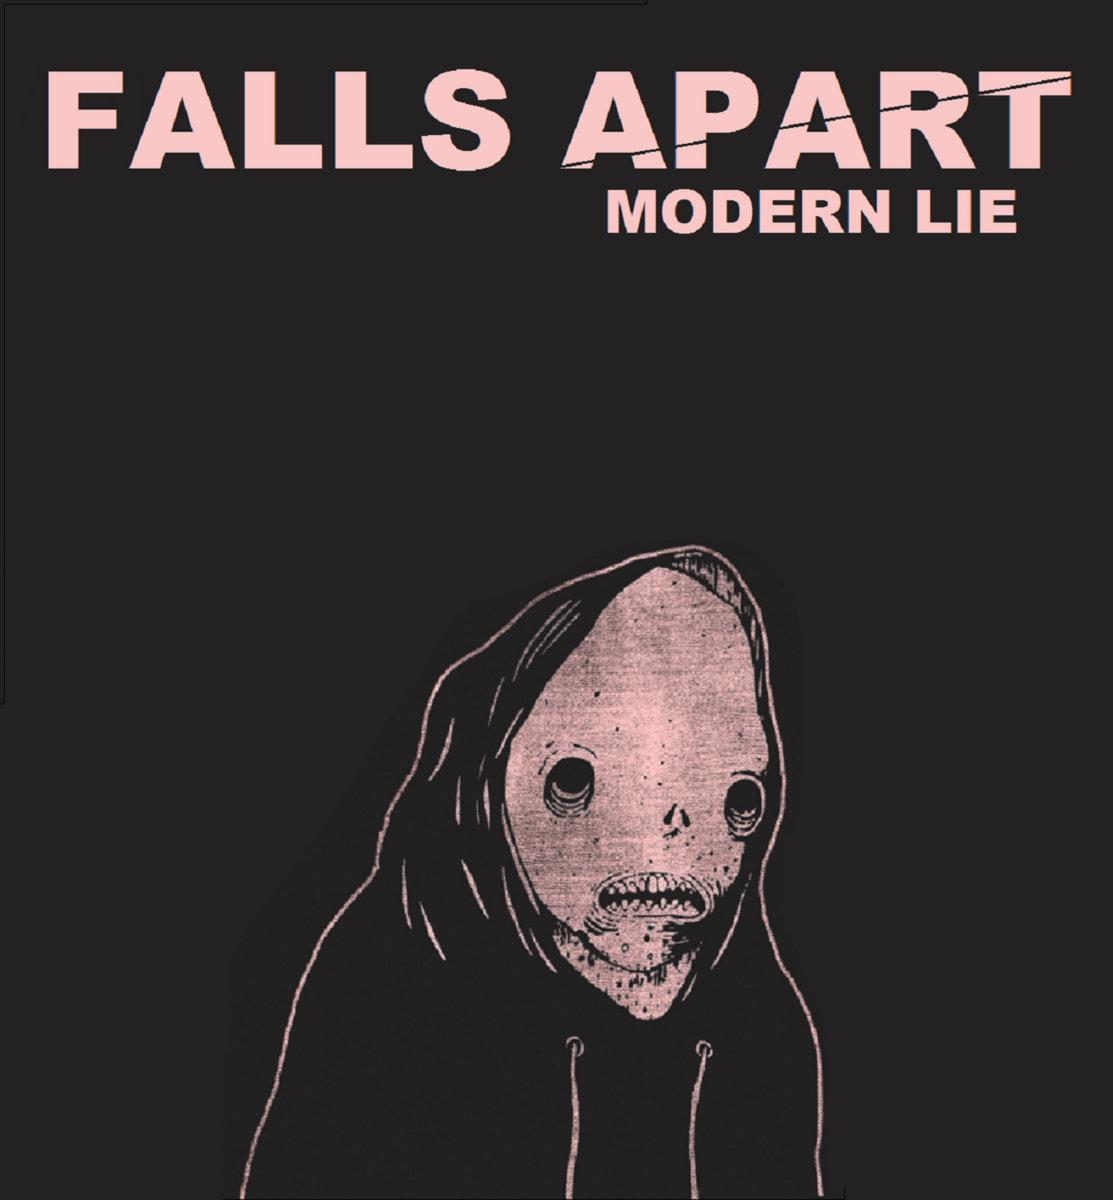 Falls Apart - MODERN LIE [single] (2016)